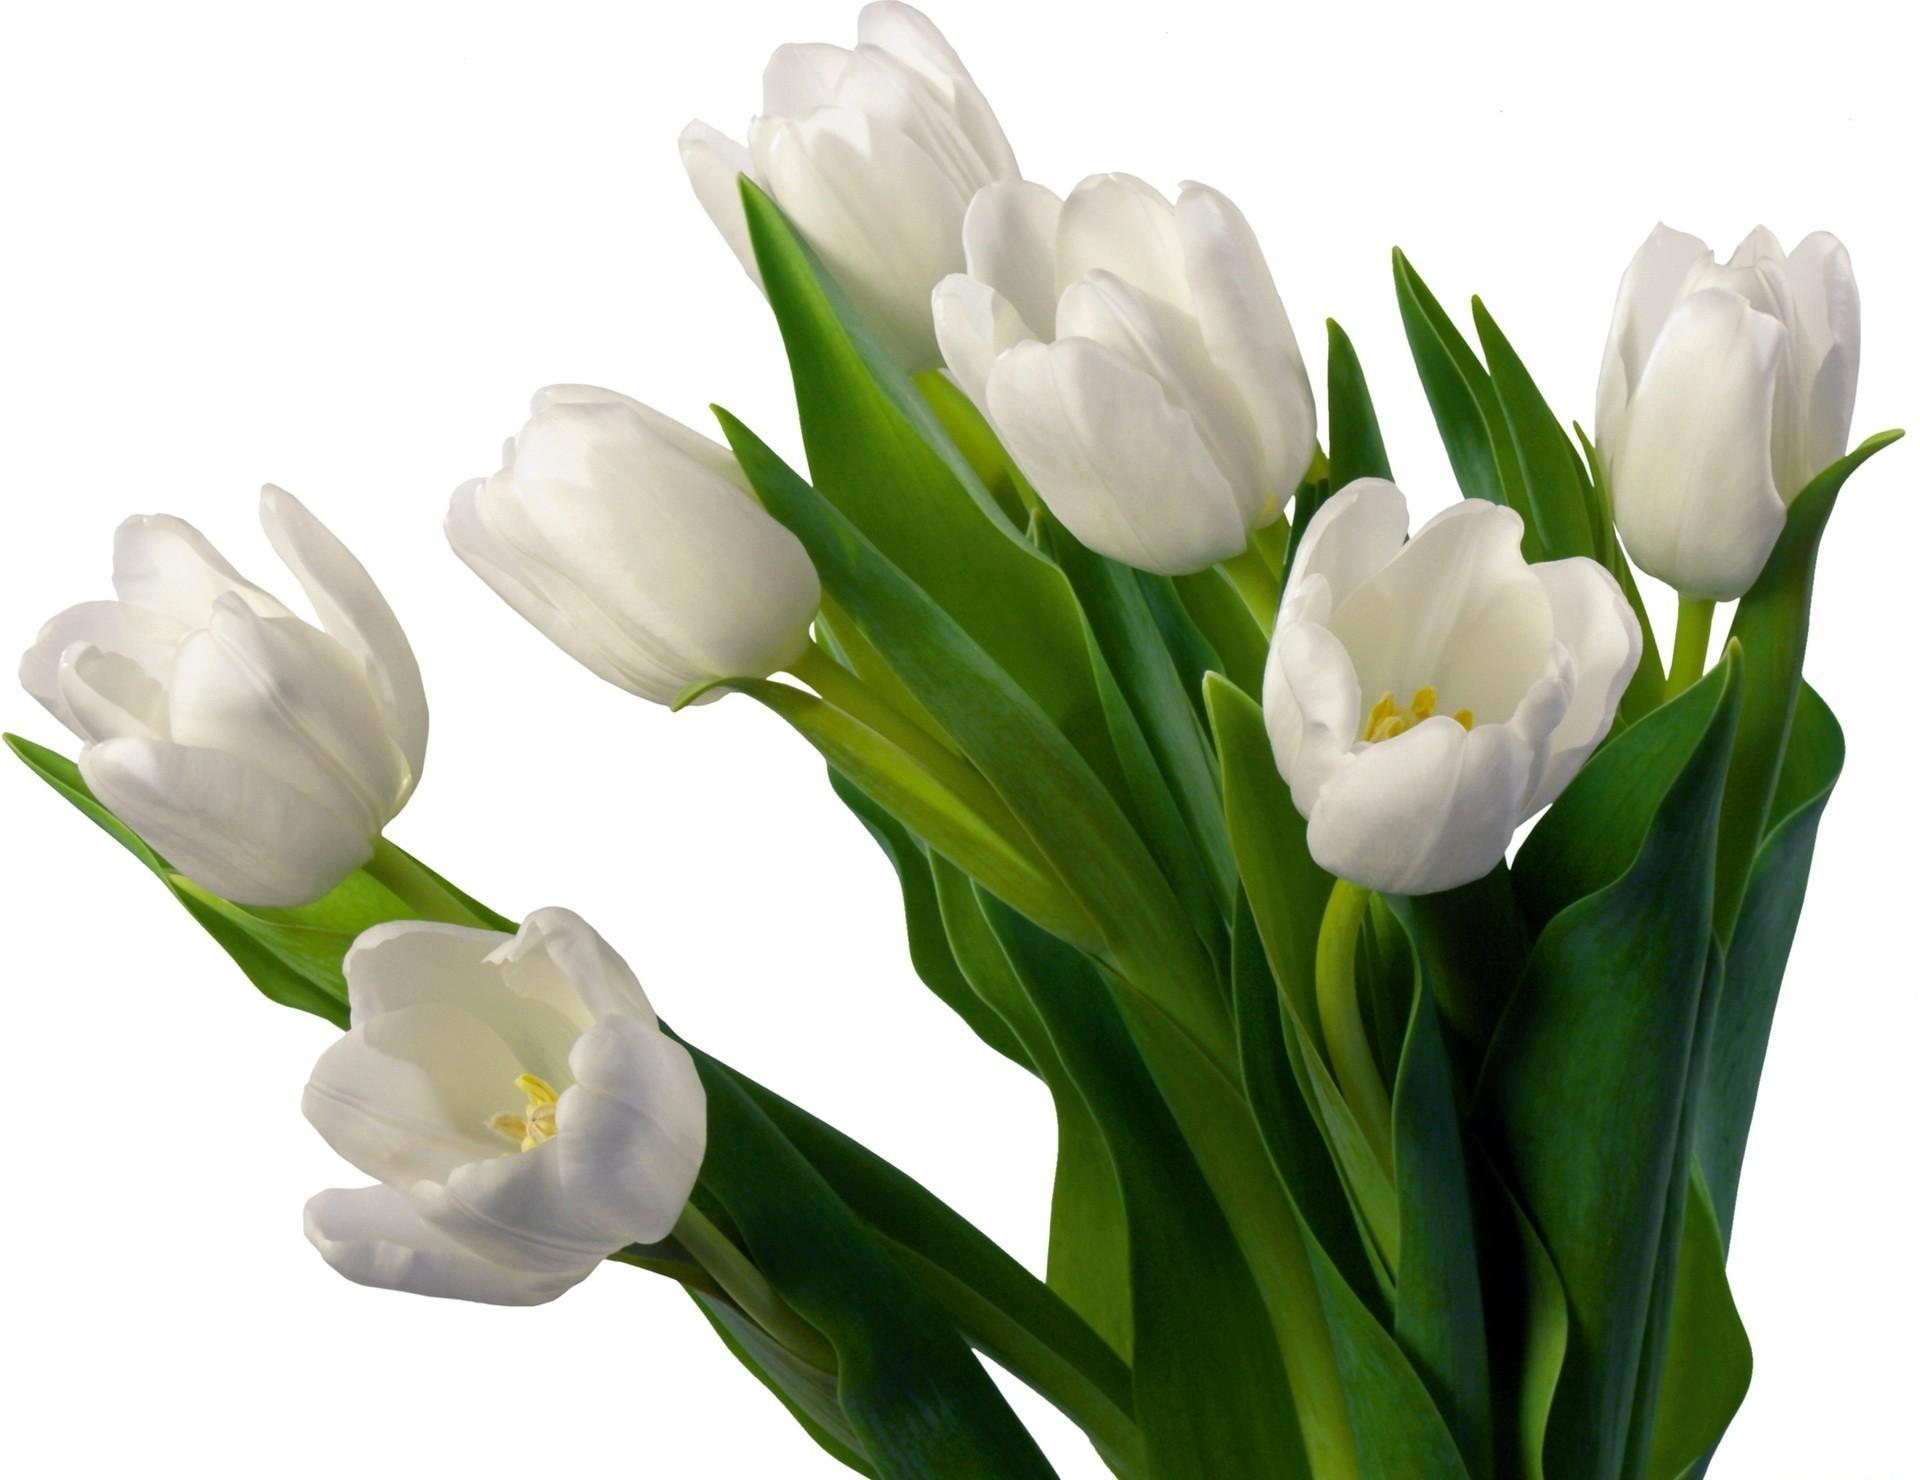 Wallpaper tulips flowers flowerbed flower white background tulips flowers flowerbed flower white background mightylinksfo Images